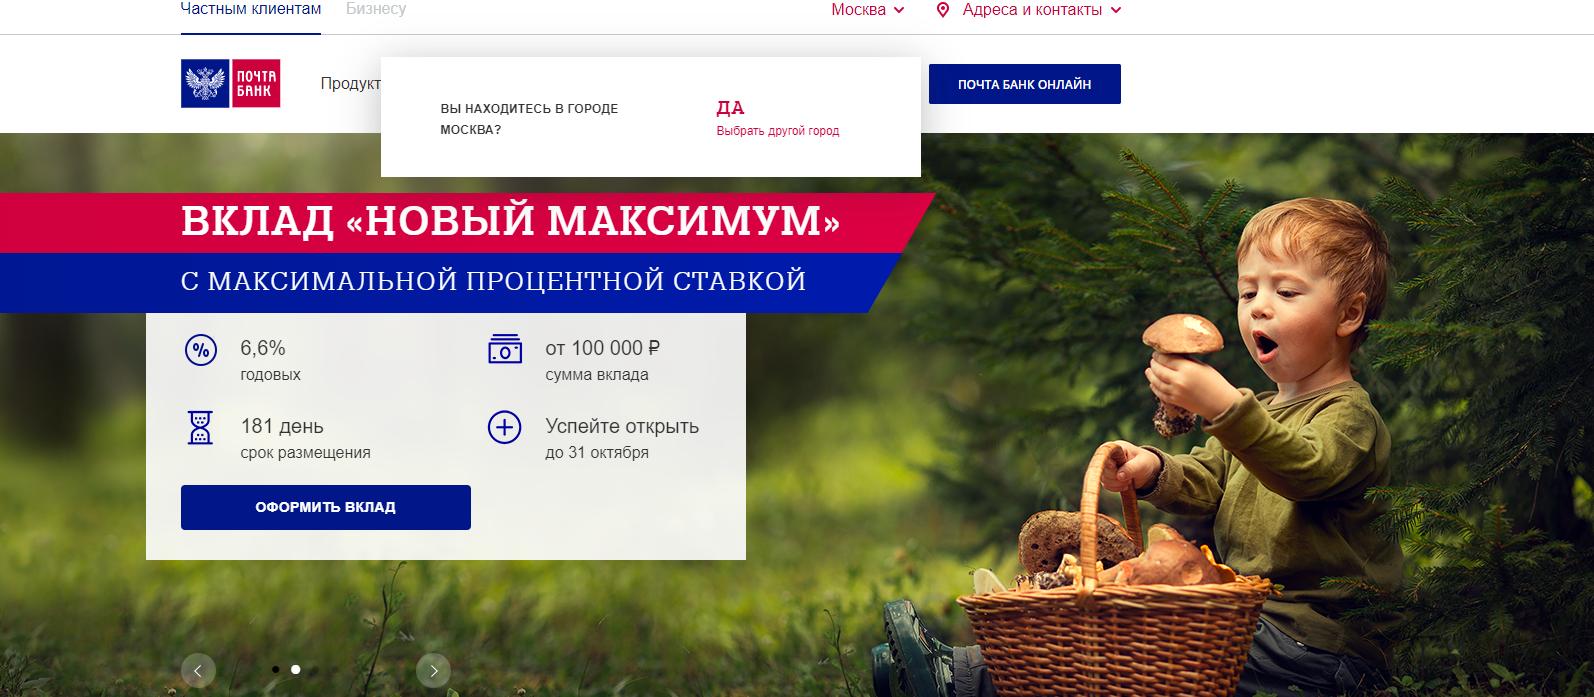 pochta-bank-kredit_